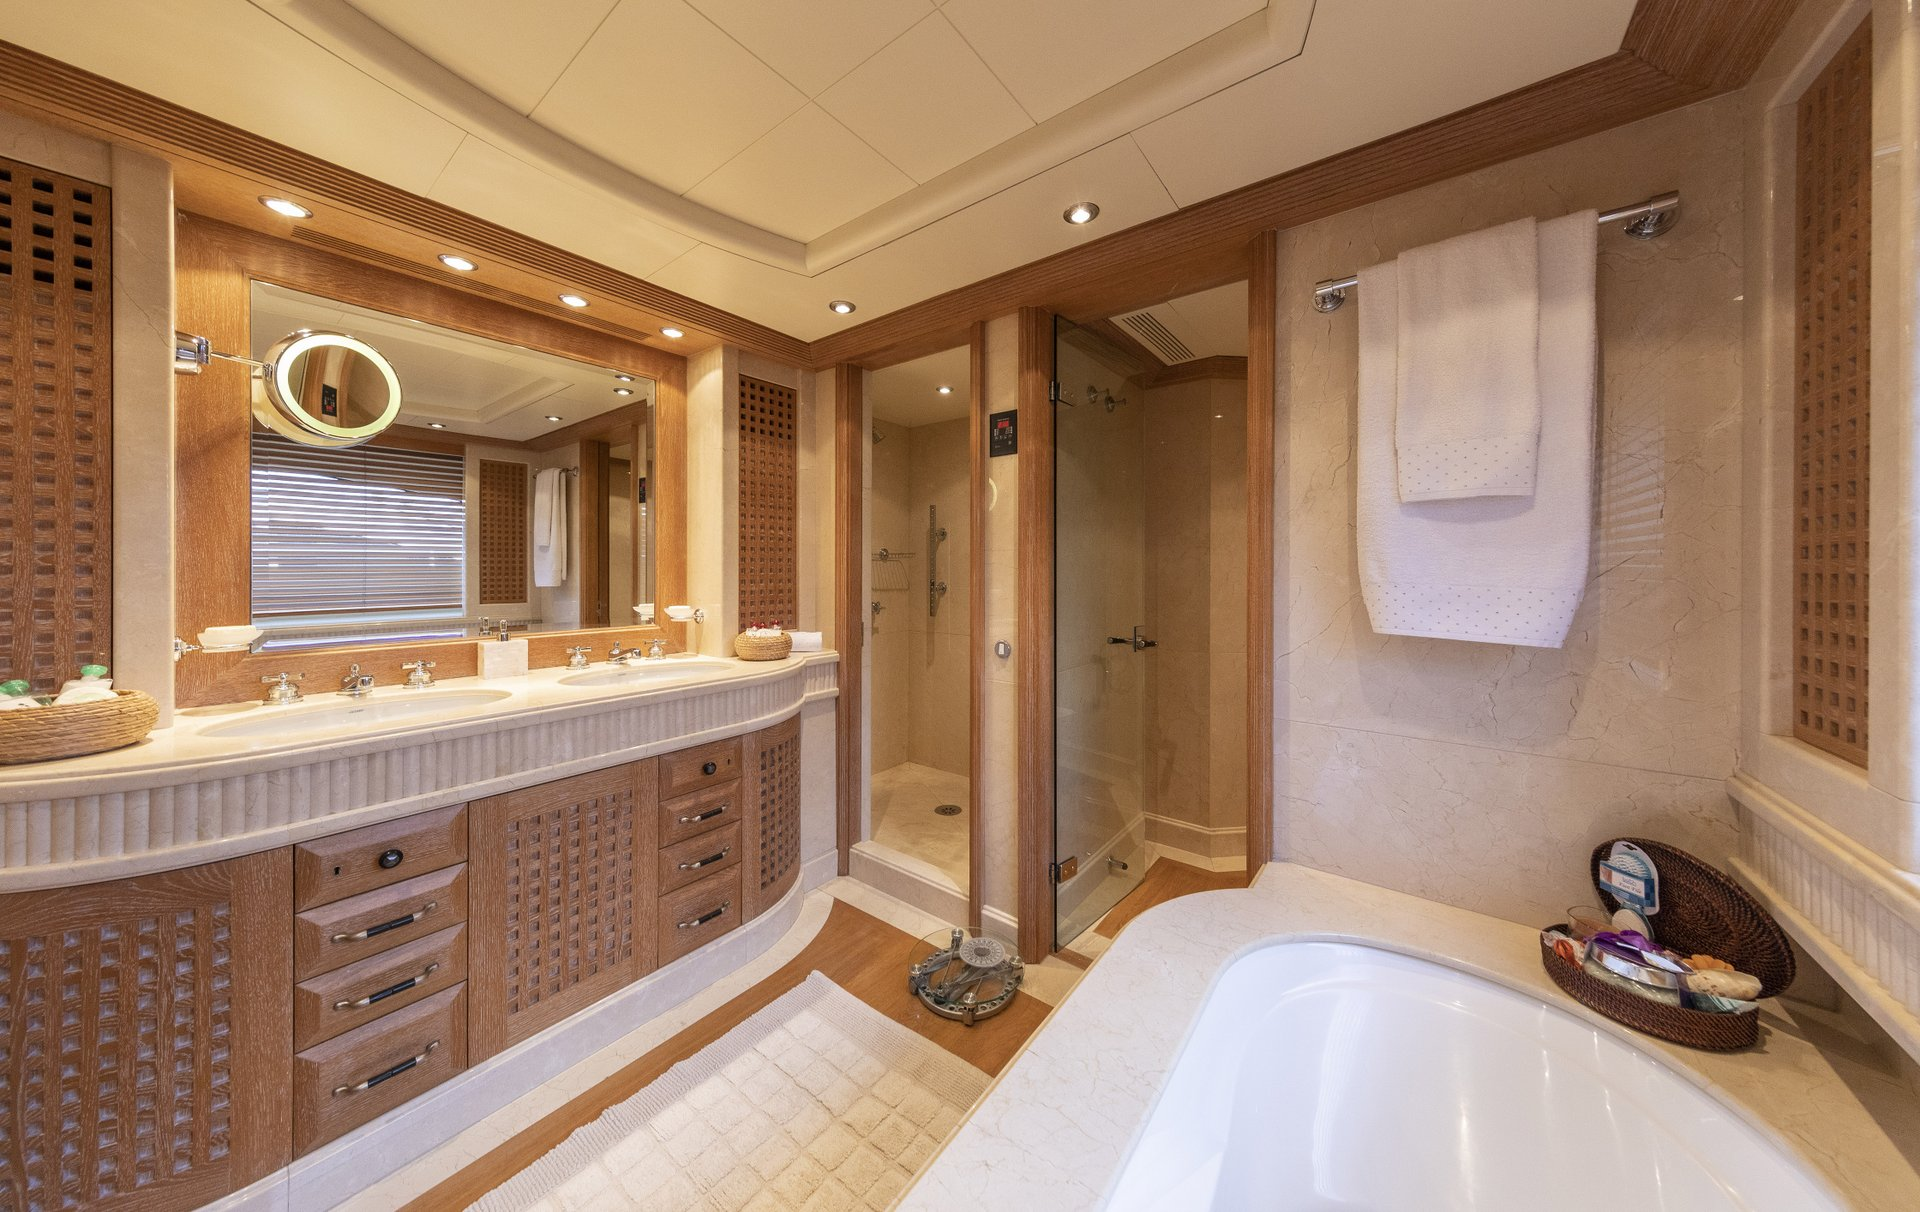 m/y alexandra yacht for charter master bathroom